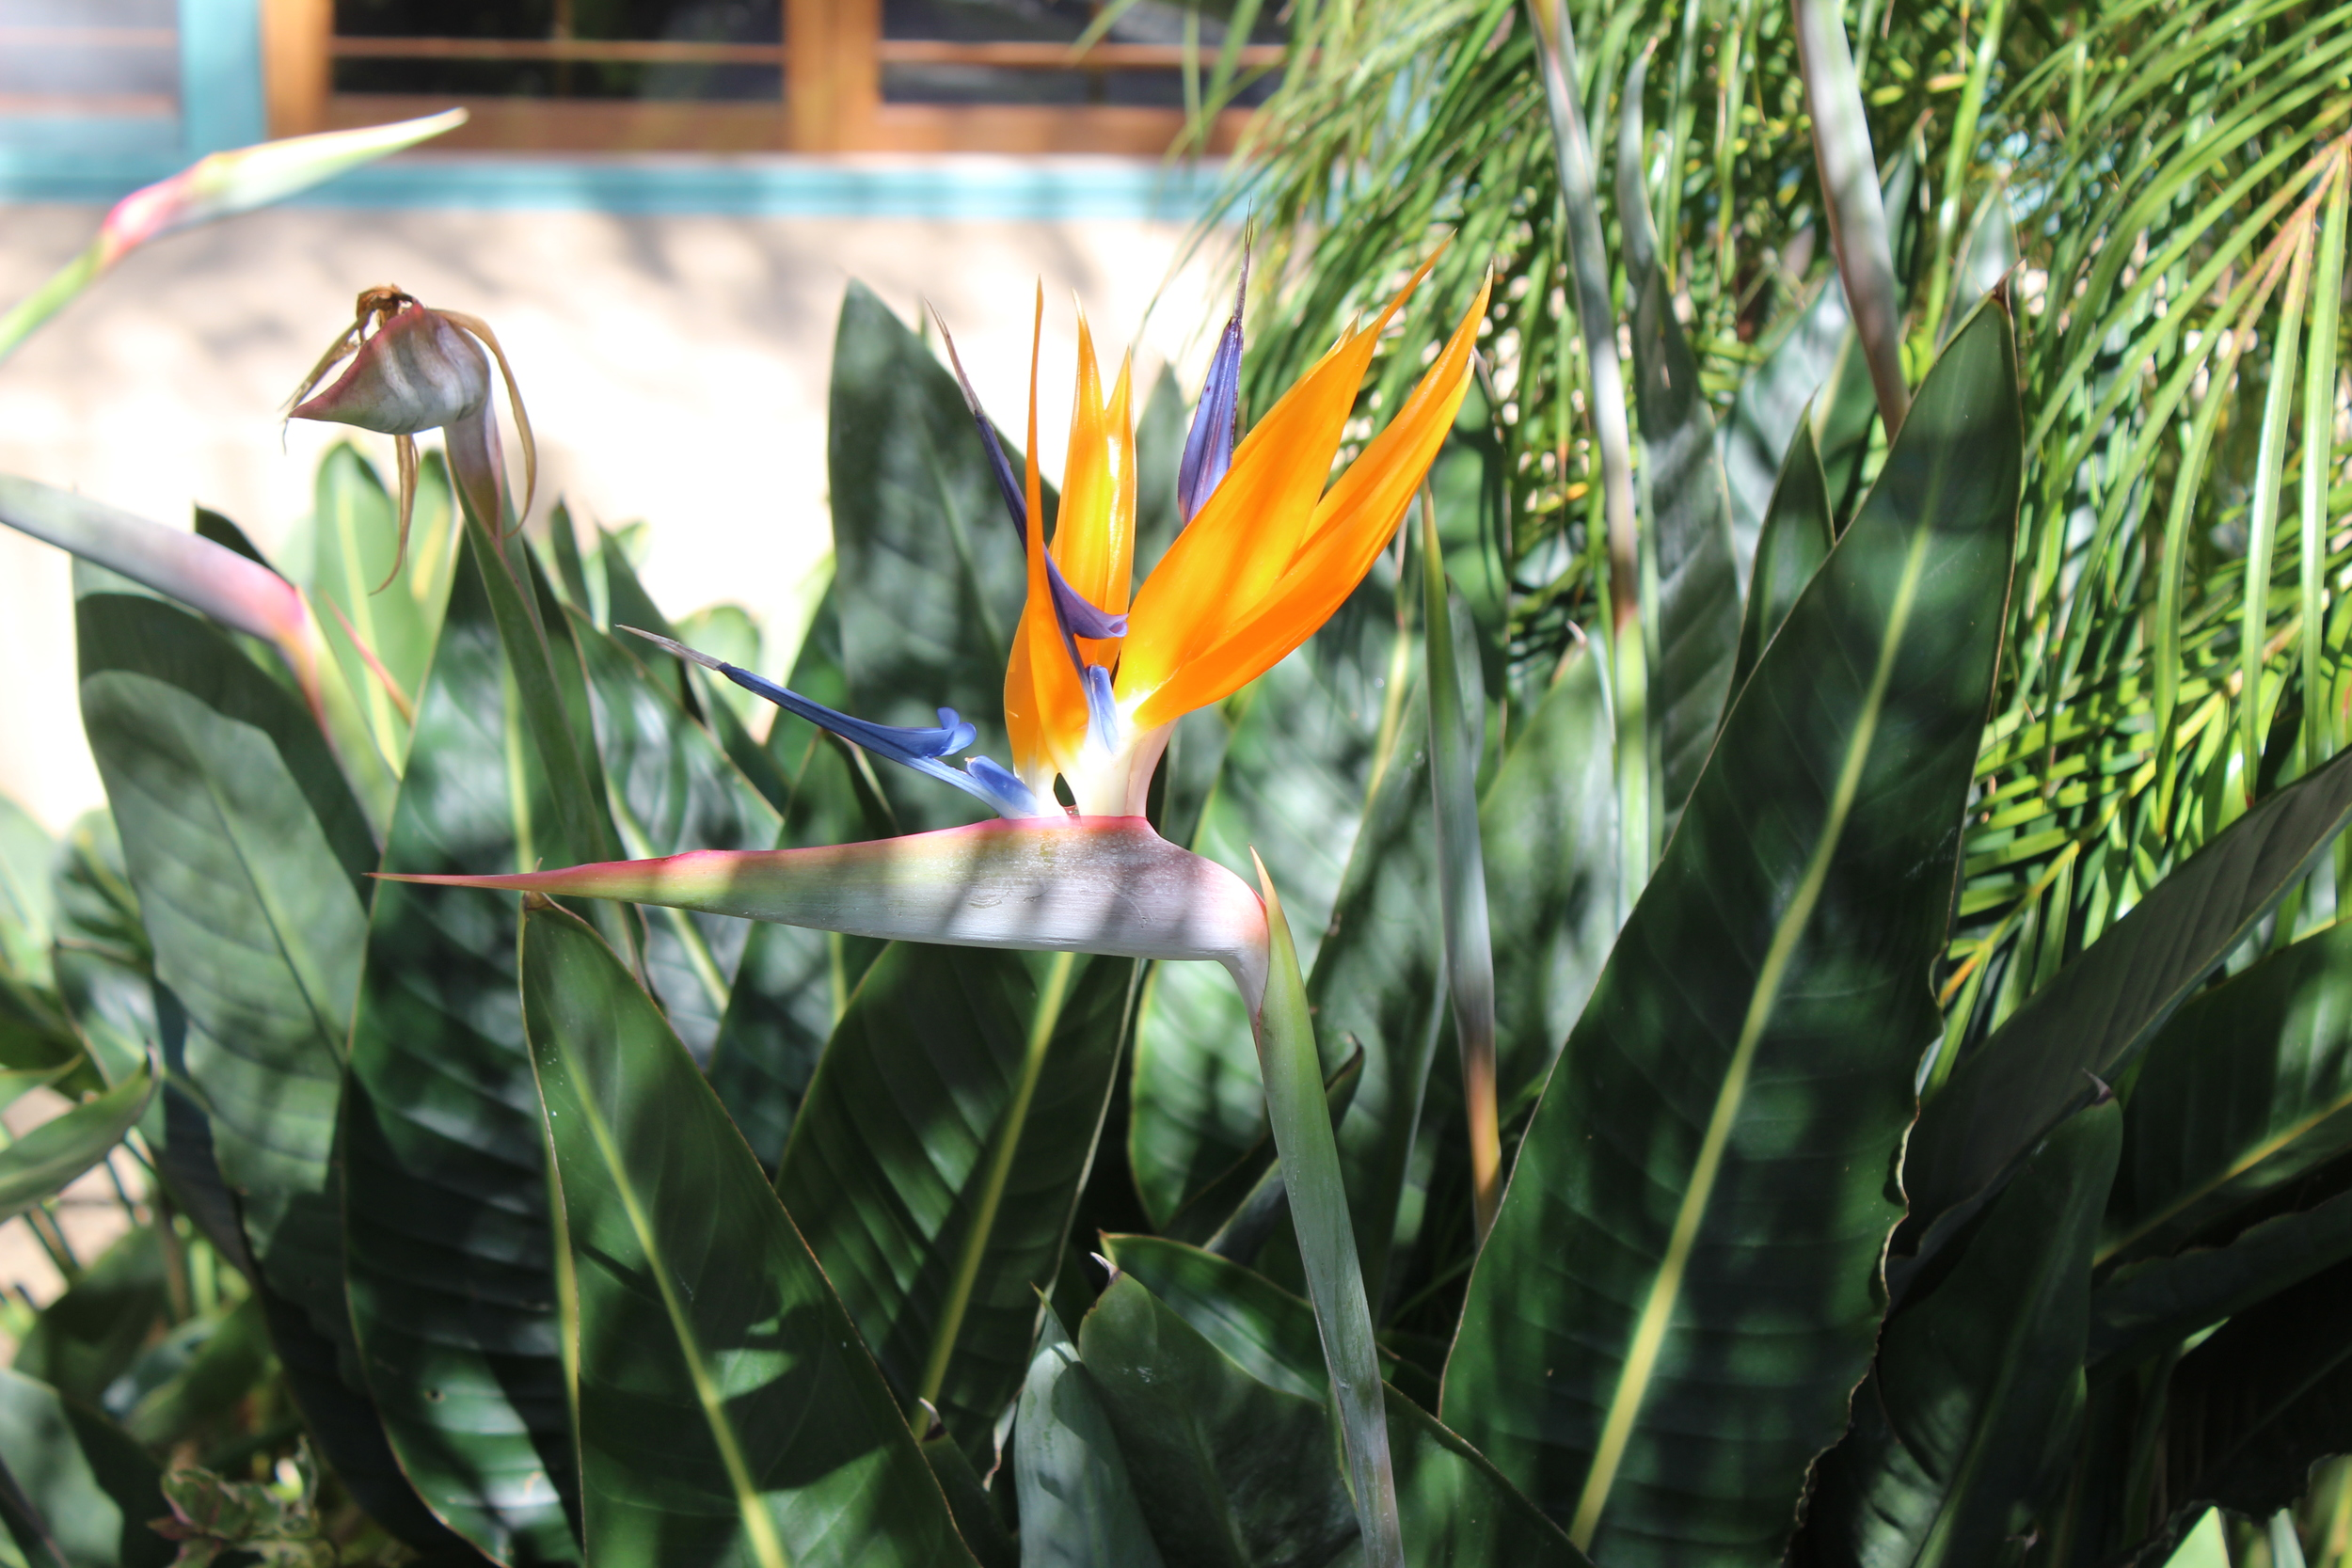 Birds of Paradise are beautiful!